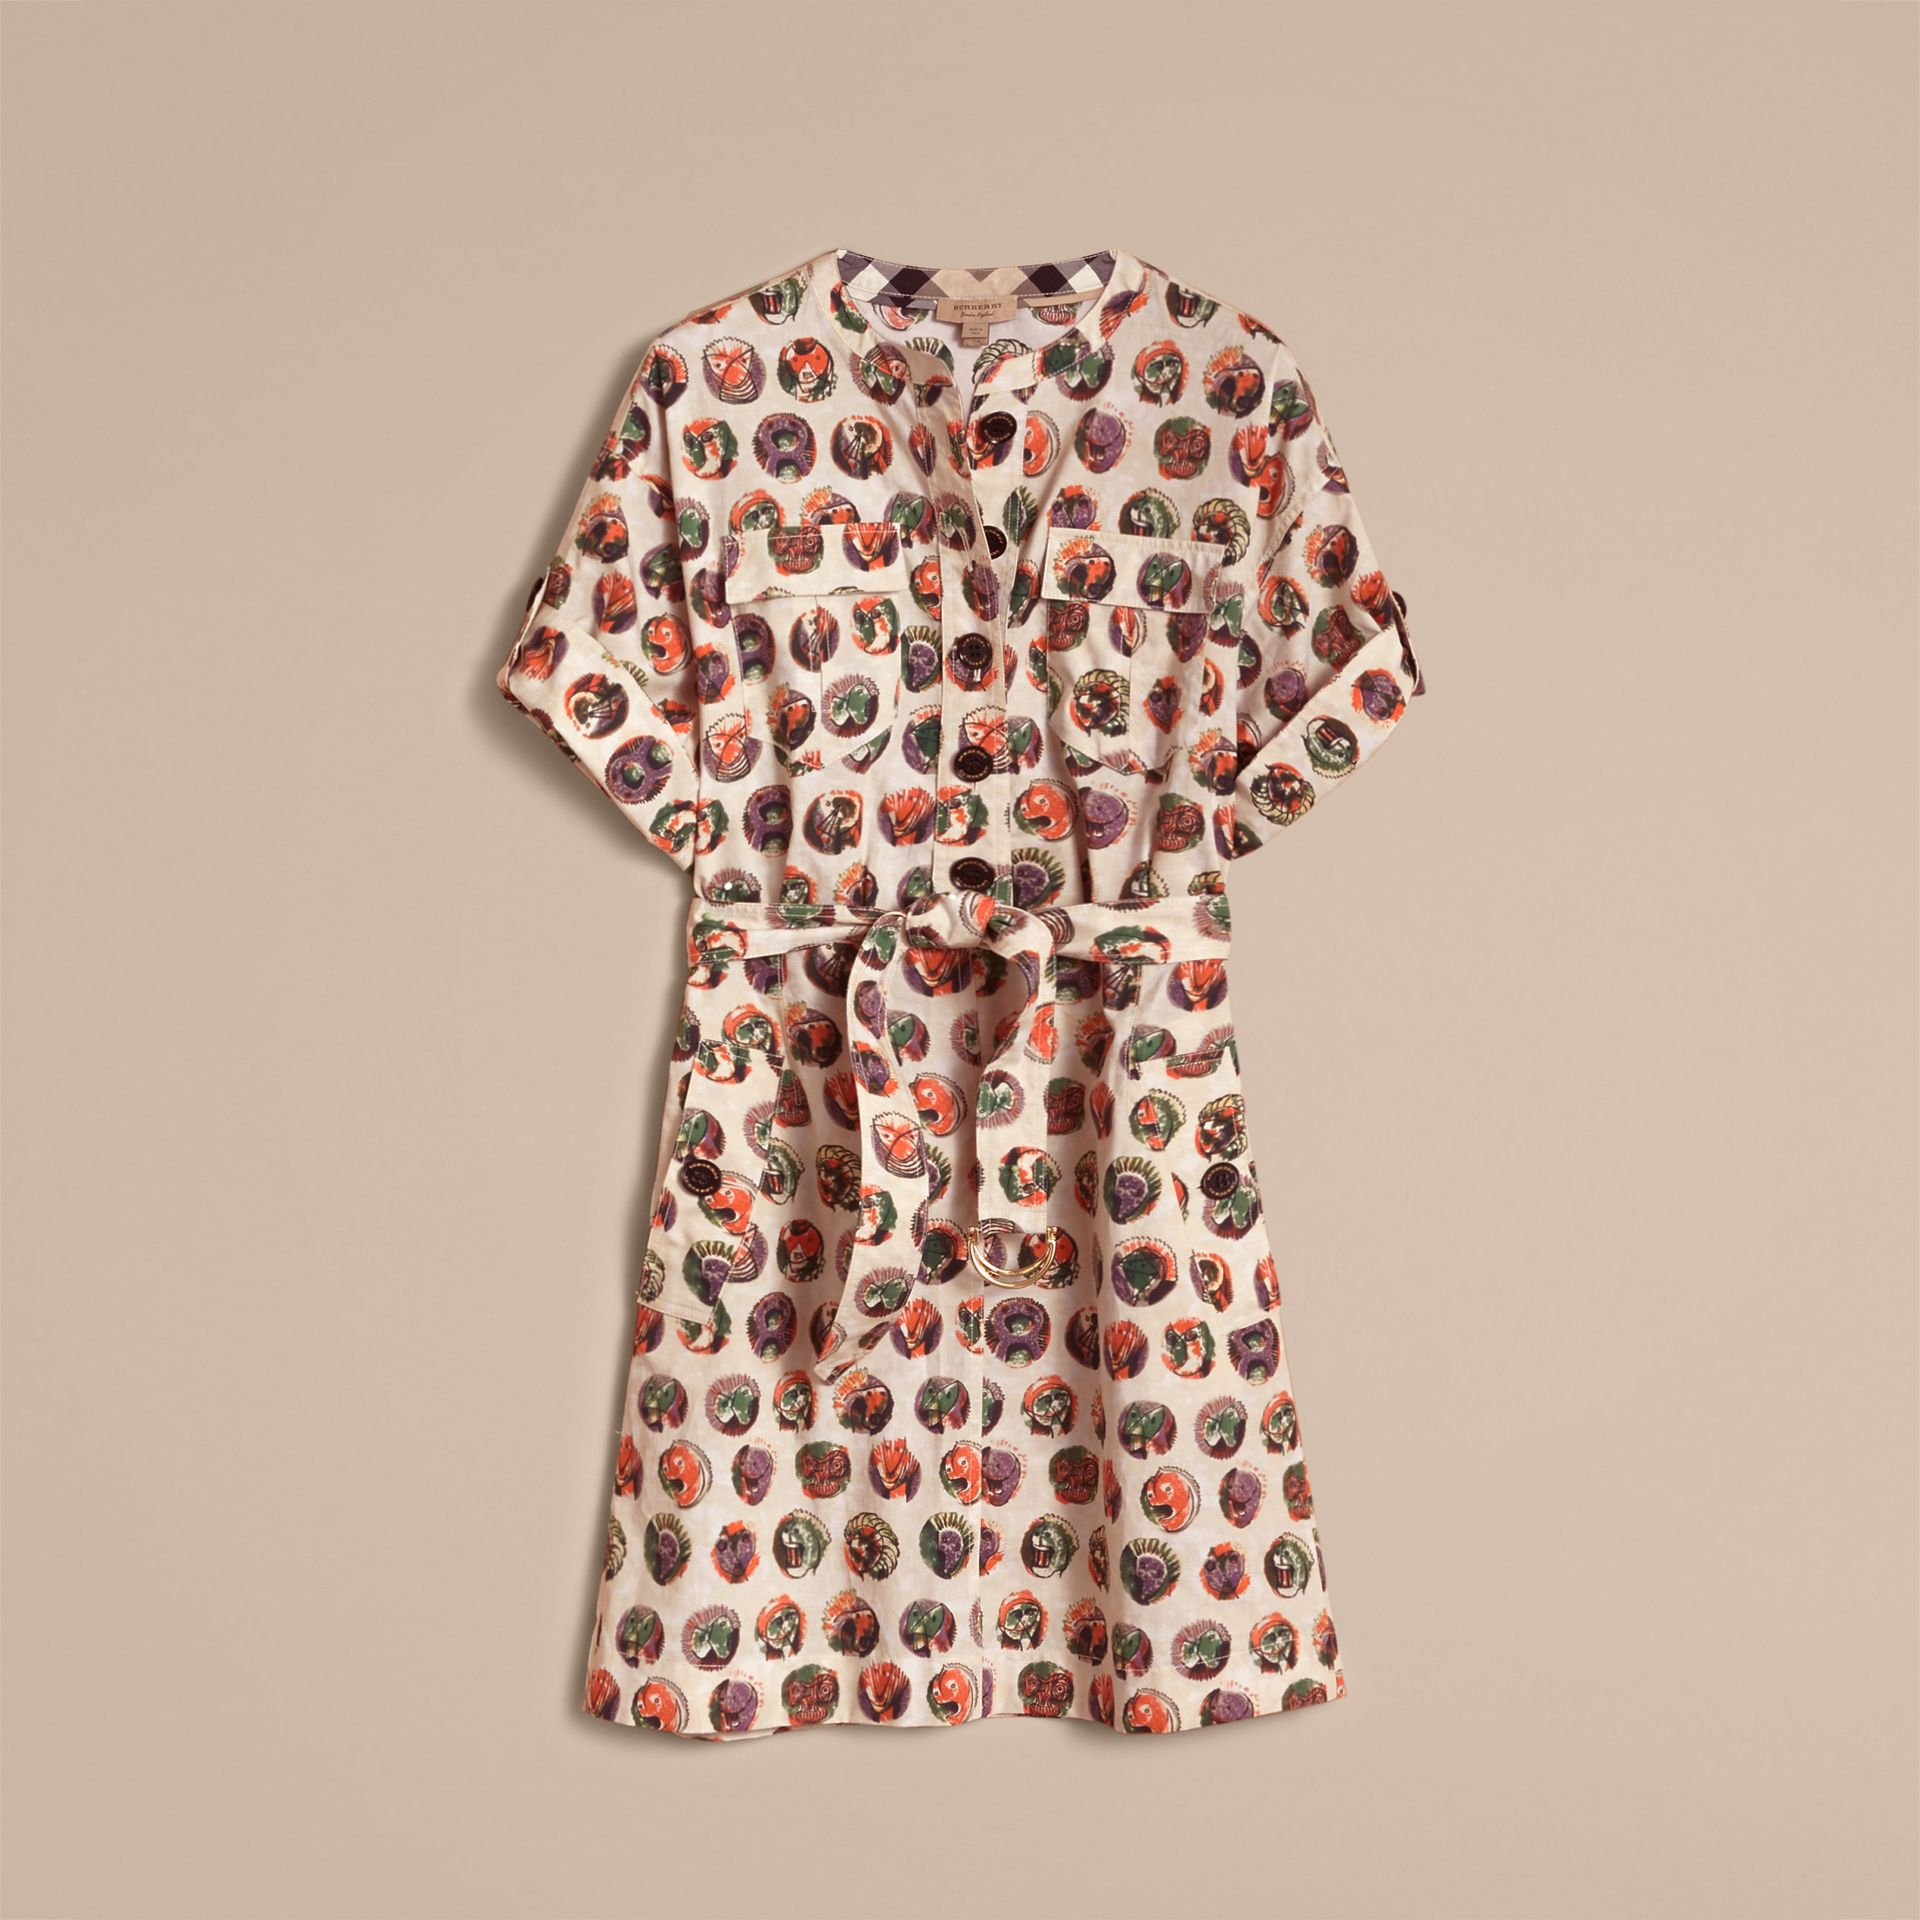 Pallas Heads Print Stretch Cotton Shirt Dress in Natural White - Women | Burberry Hong Kong - gallery image 3